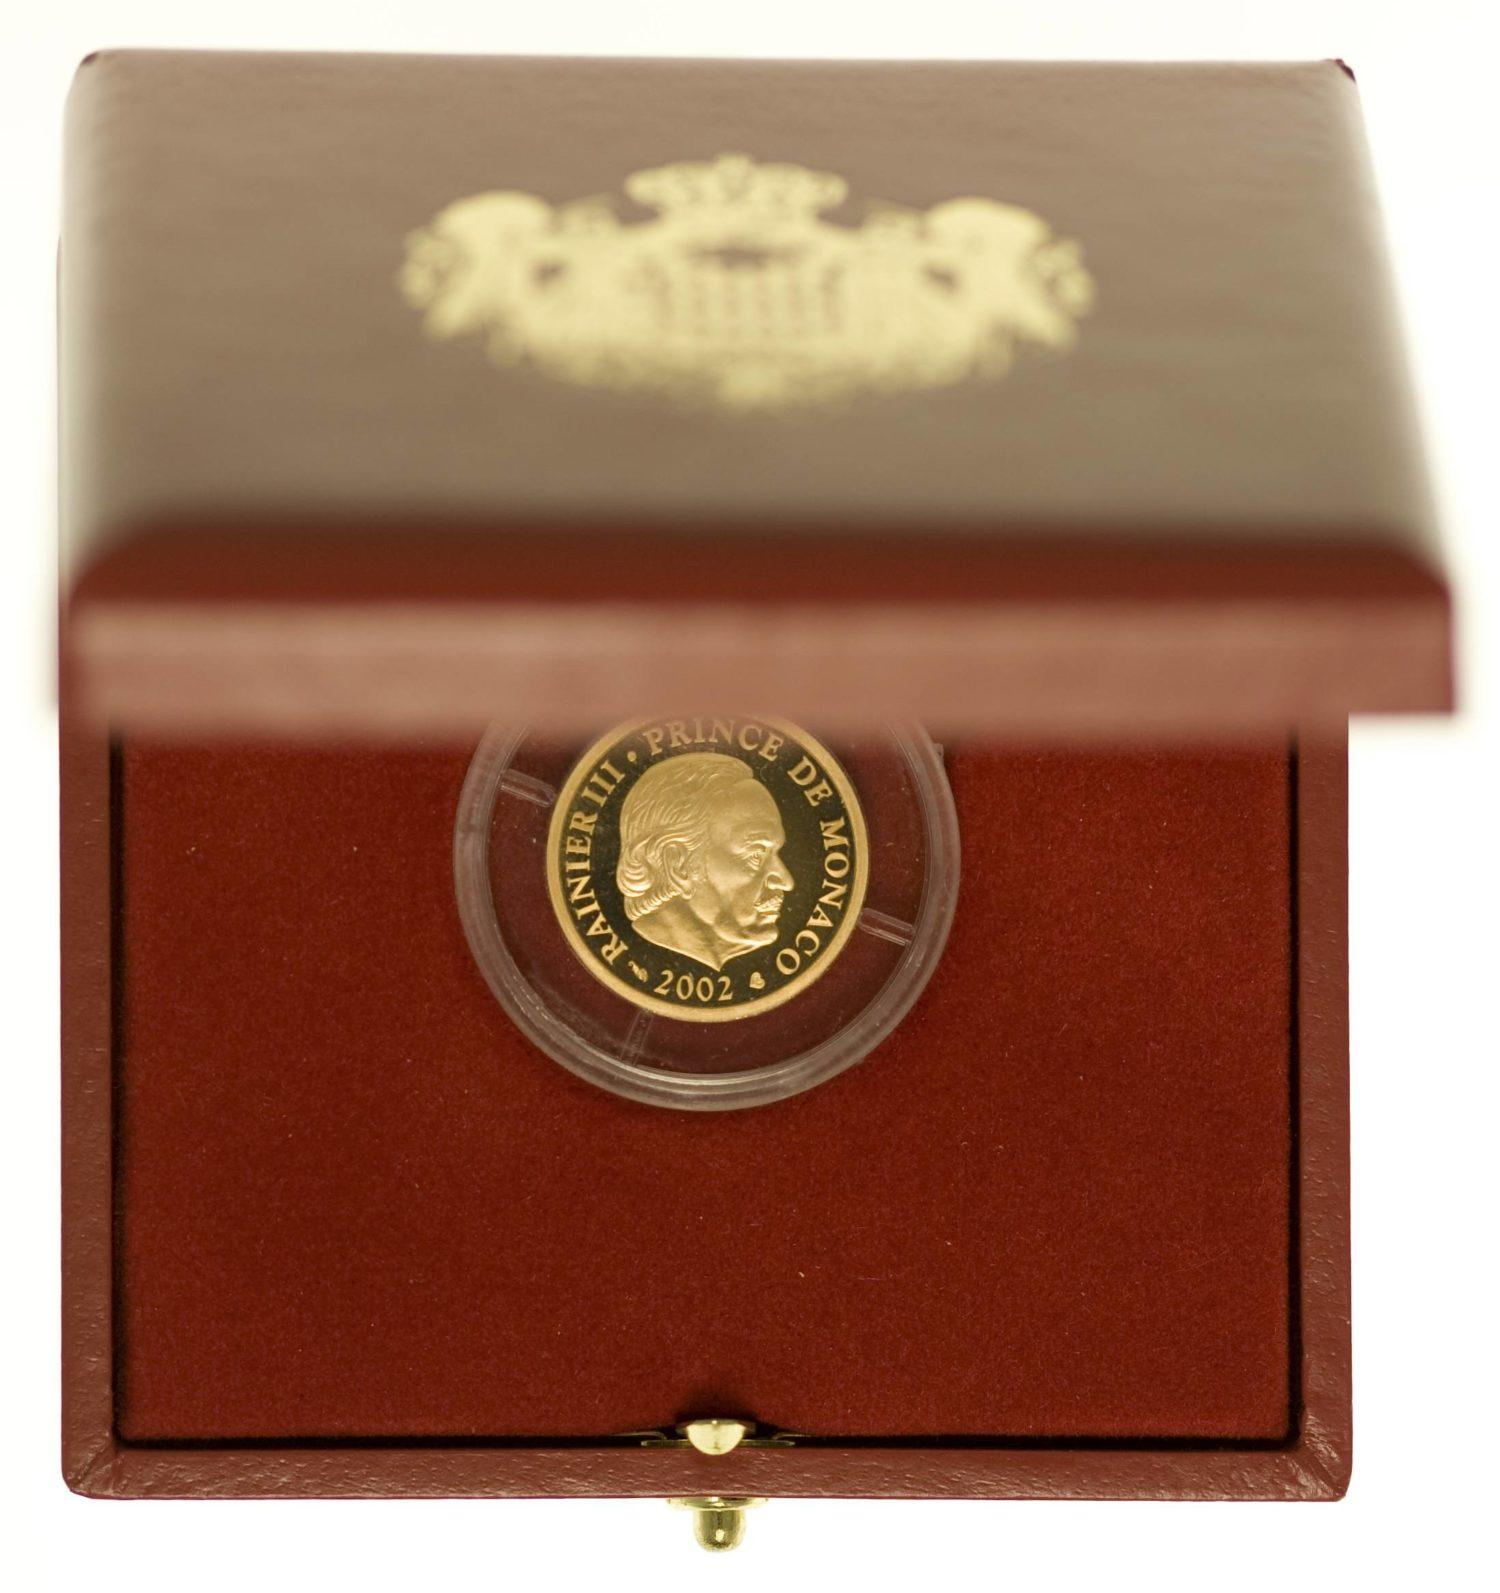 Monaco Rainier III. 20 Euro 2002 Gold 5,81 Gramm fein RAR